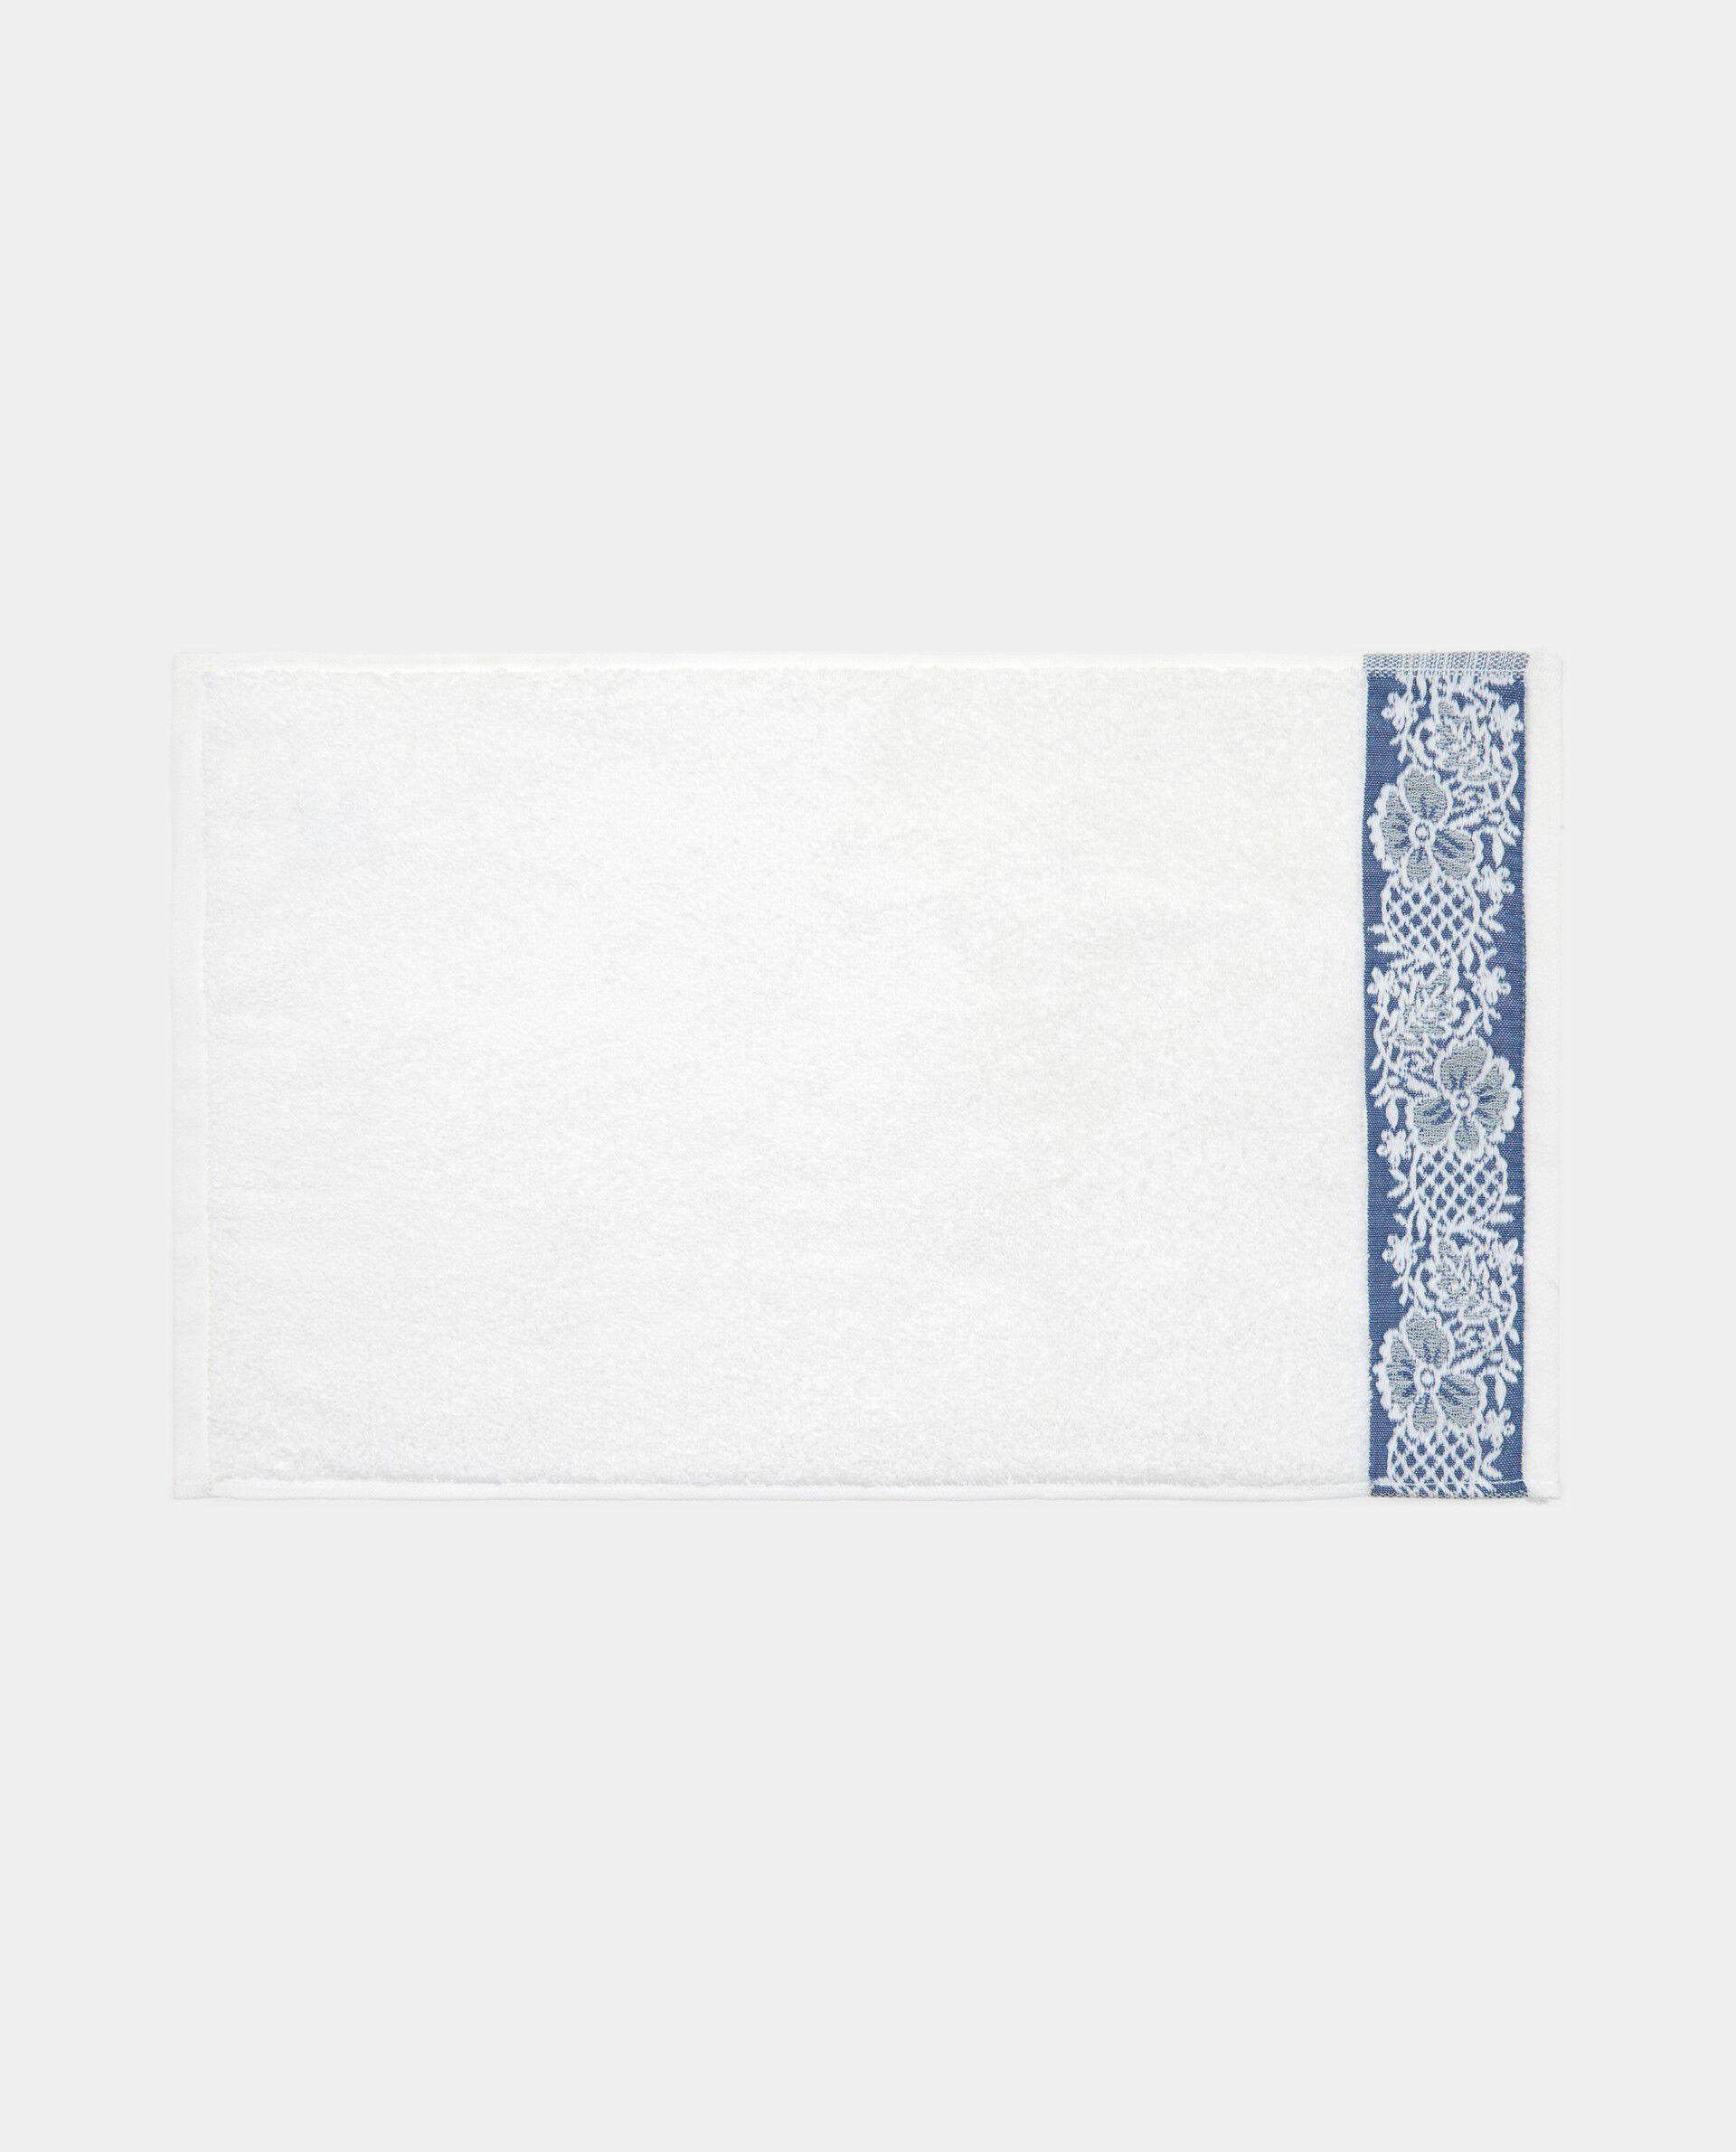 Asciugamano cotone jacquard floreale